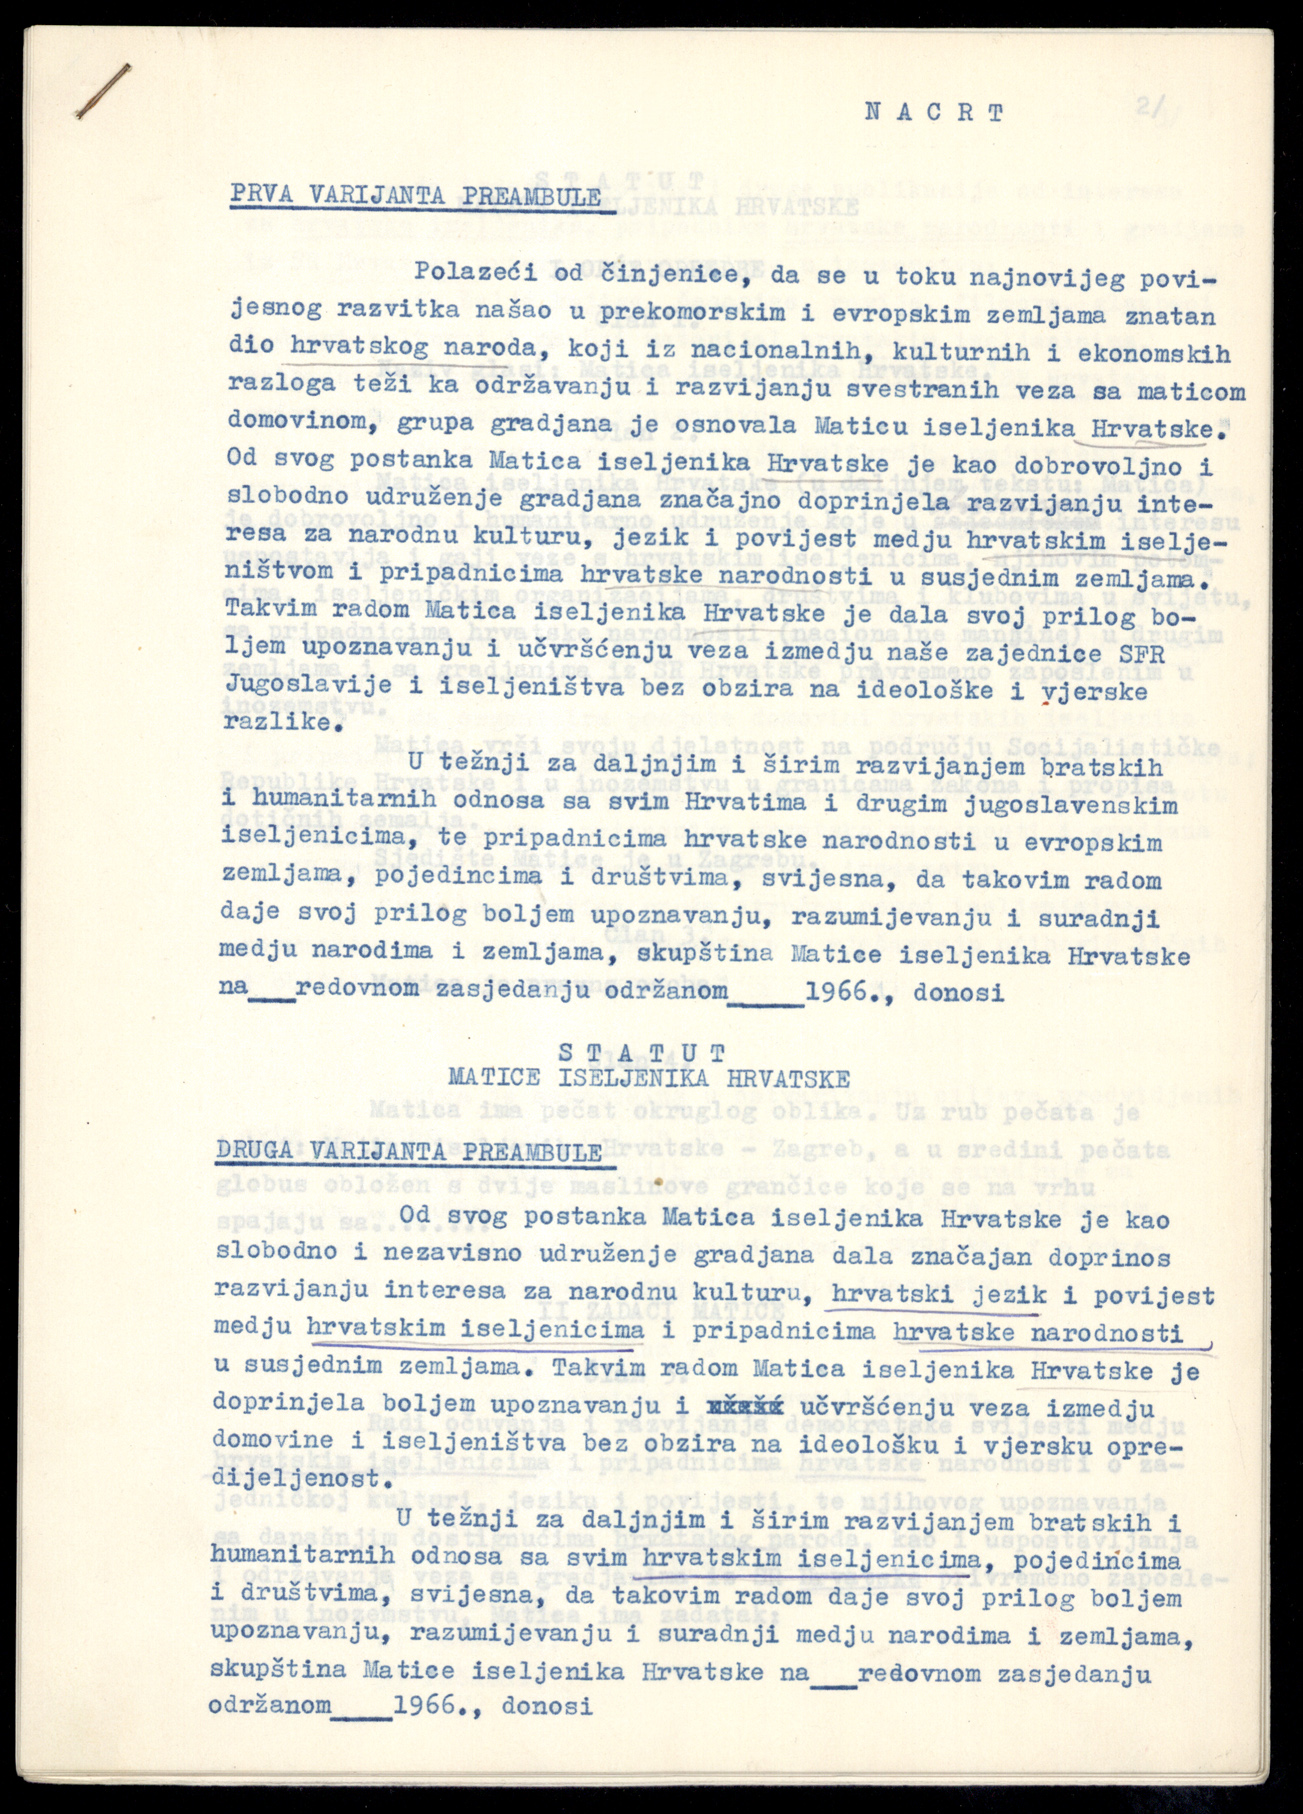 The Emigrant Foundation of Croatia Statute Draft, 1966